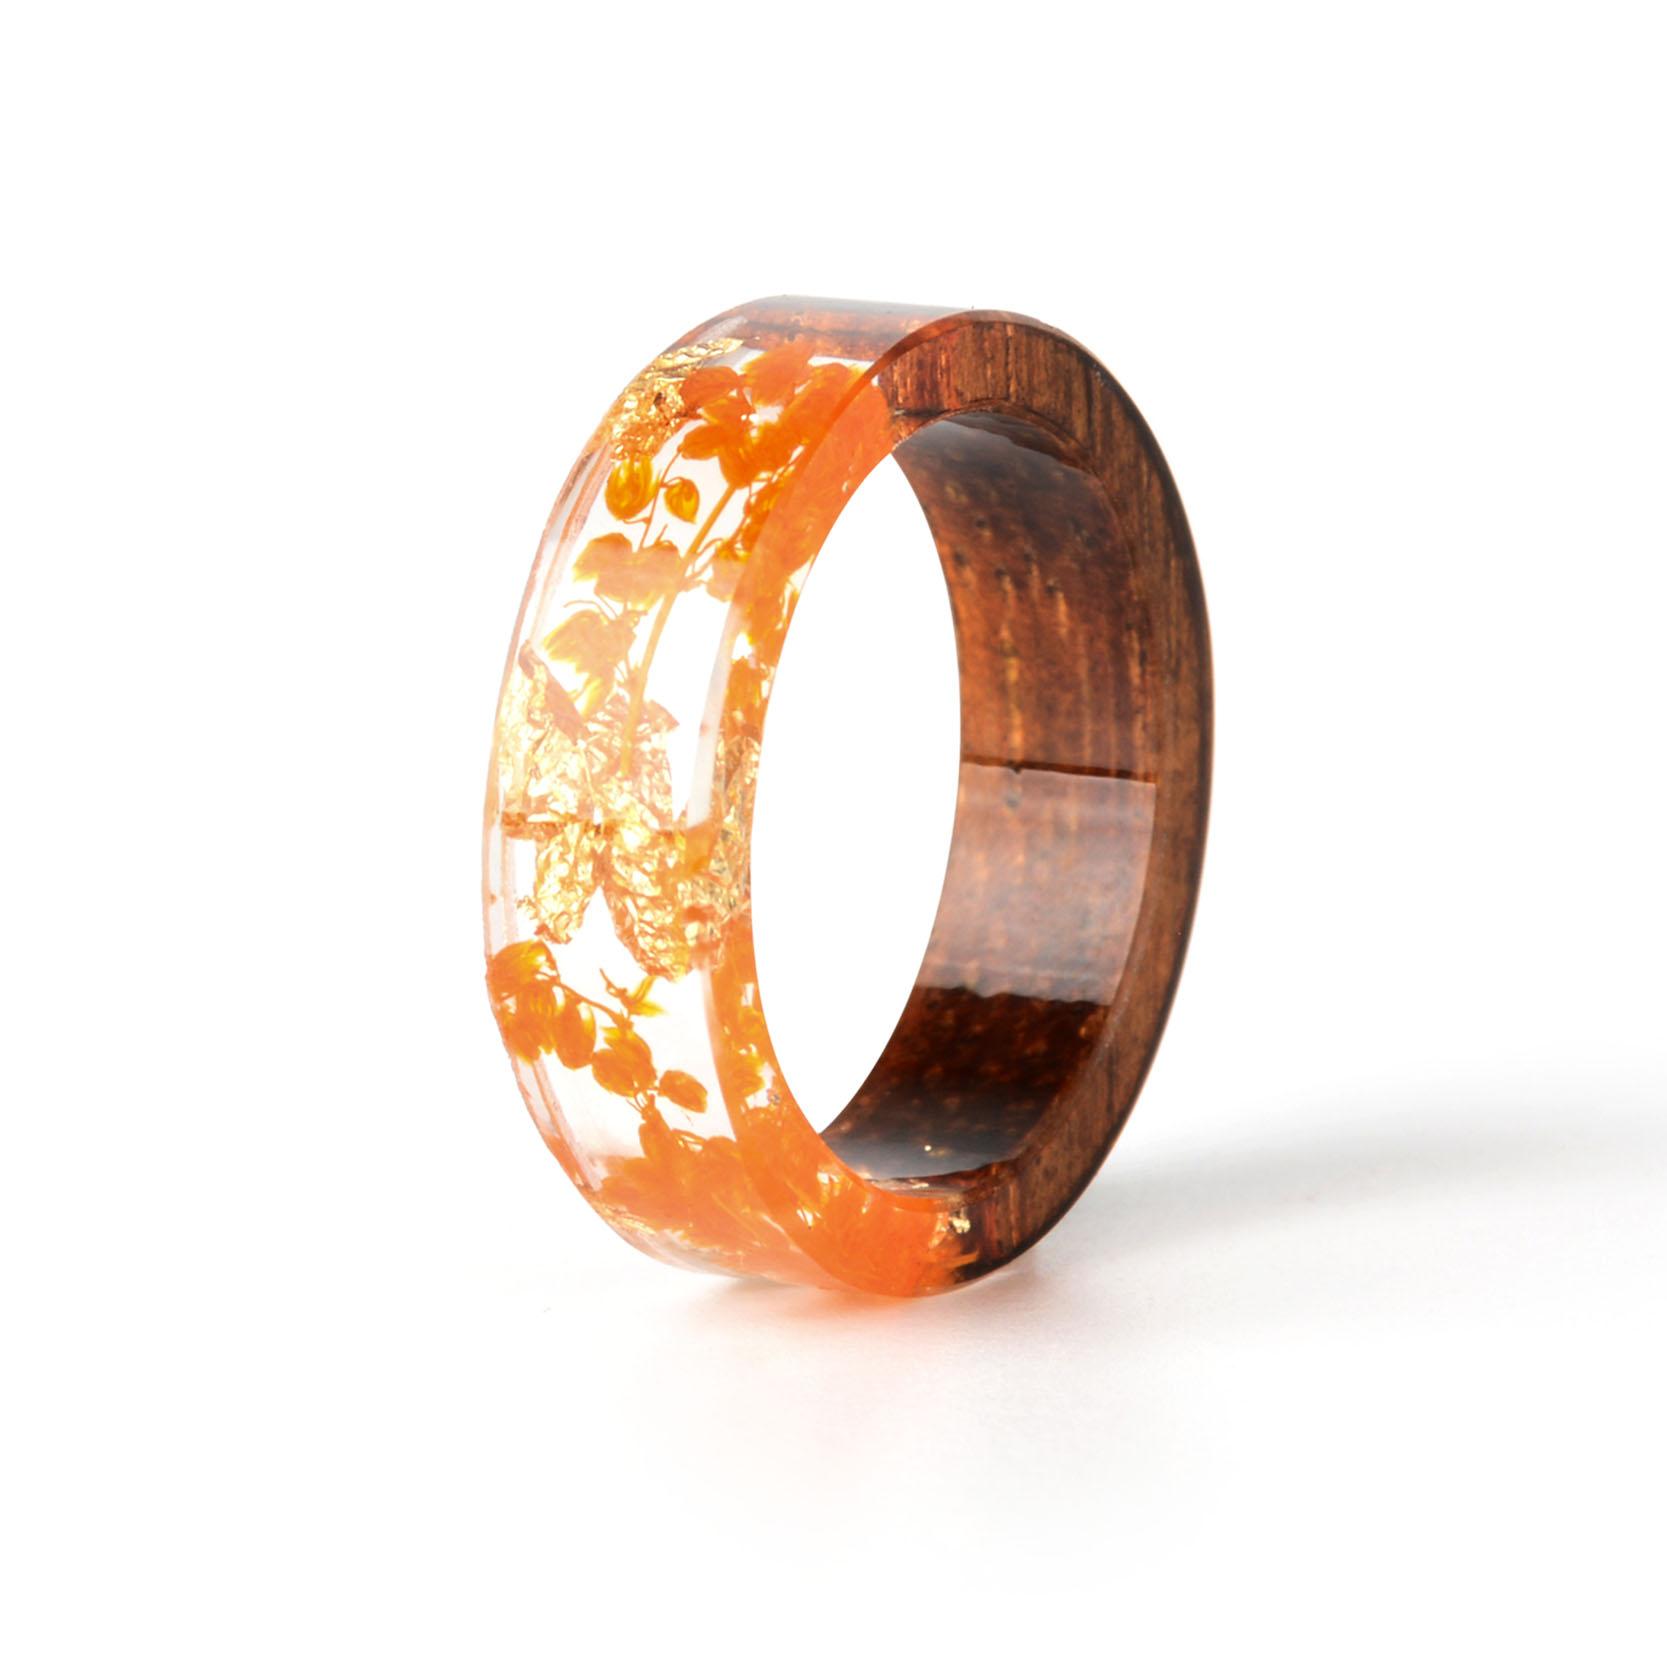 Handmade Wood Resin Ring Many Styles 22